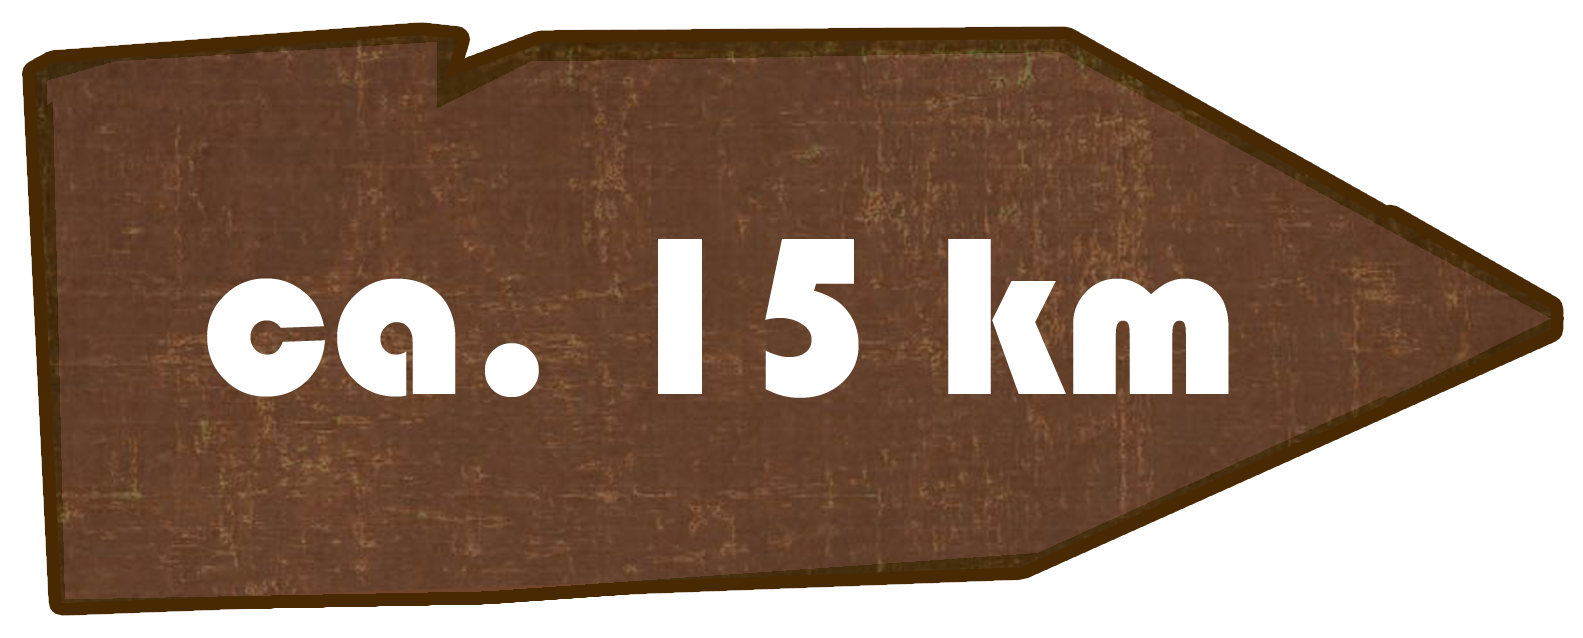 Kilometer Obercunnersdorf - Niedercunnersdorf - Großschweisnitz- Dürrhennersdorf - Kottmarsdorf - Obercunnersdorf